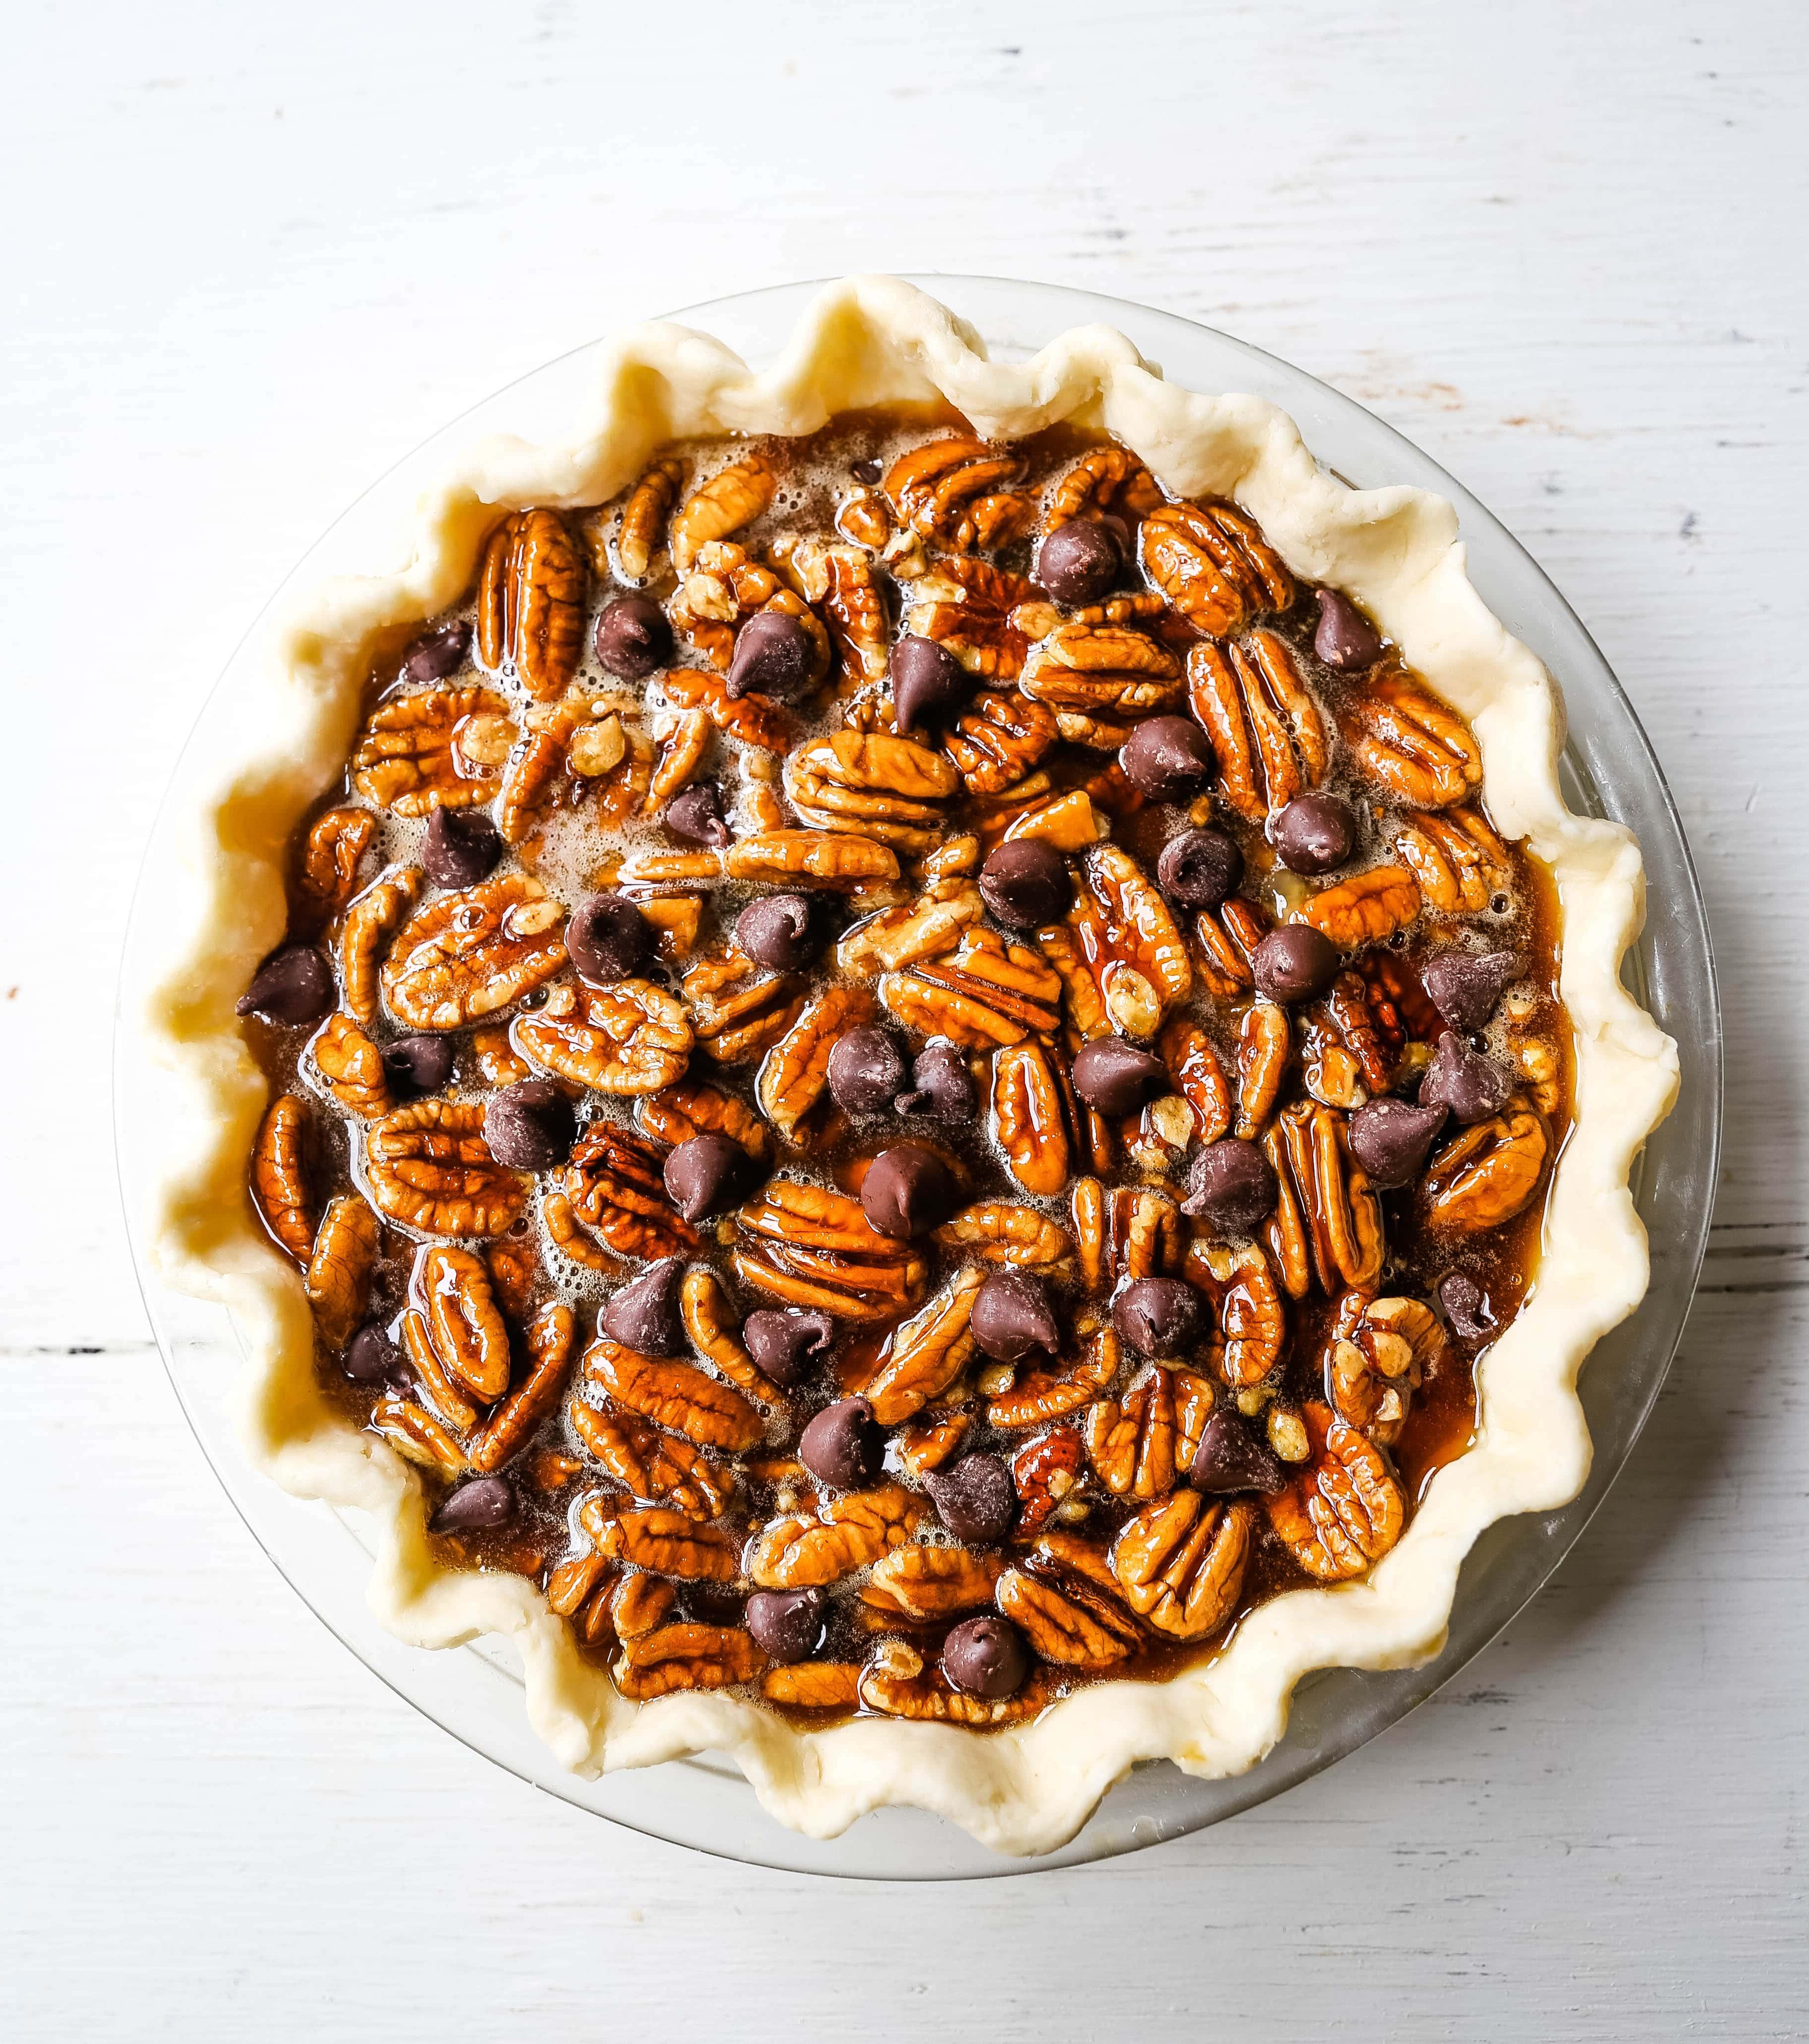 Chocolate Pecan Pie Rich chocolate pecan pie made with a brown sugar filling, crunchy pecans, rich chocolate, all in a homemade buttery, flaky pie crust.www.modernhoney.com #pie #pecanpie #chocolatepecanpie #thanksgiving #pies